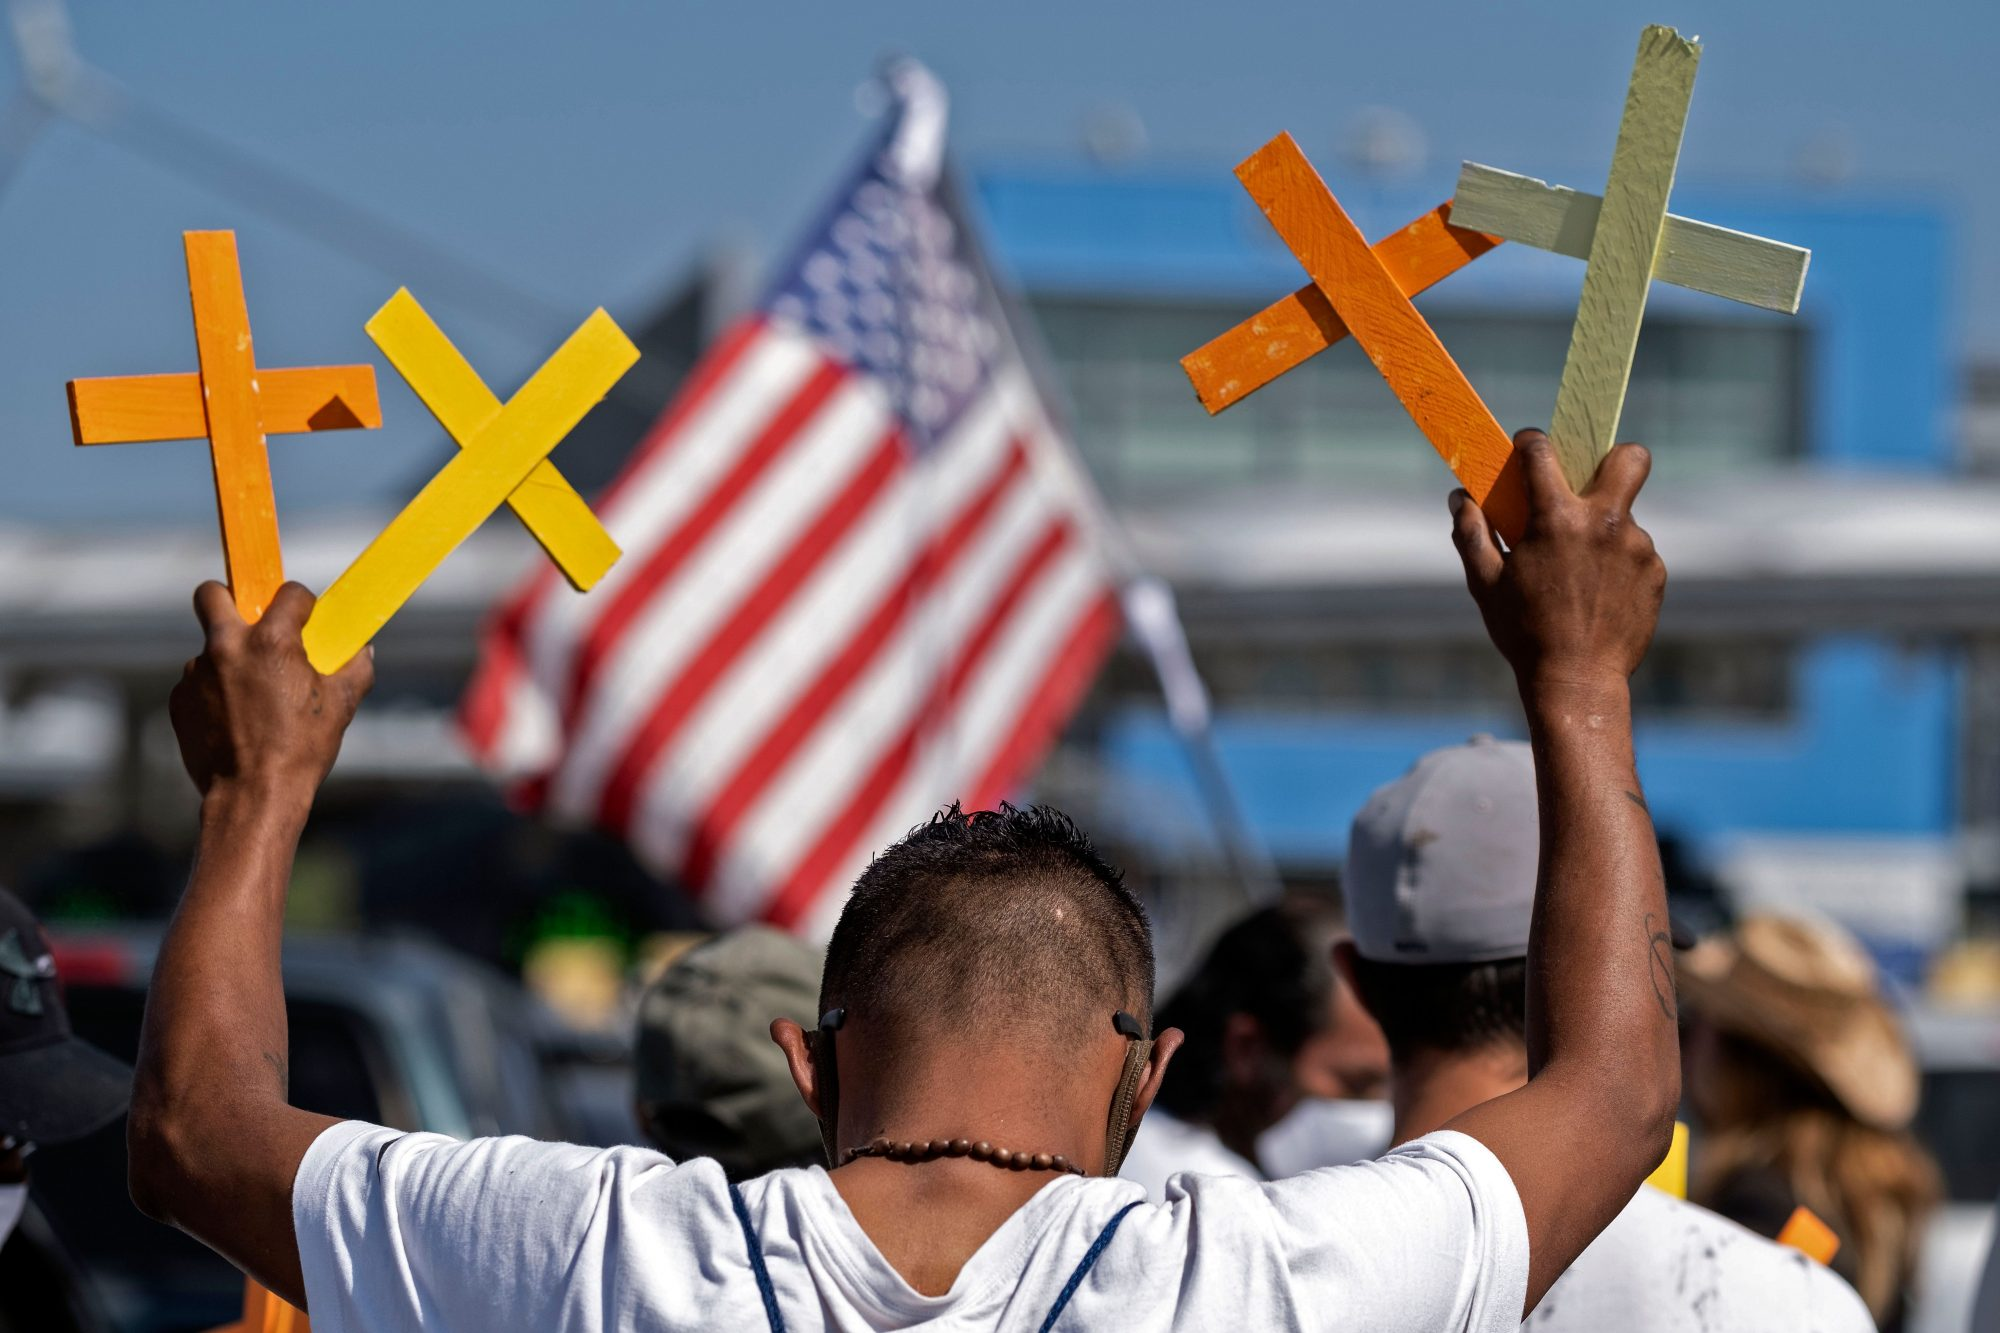 Trump Administration Wants to Block Asylum Seekers Because of Coronavirus Risk